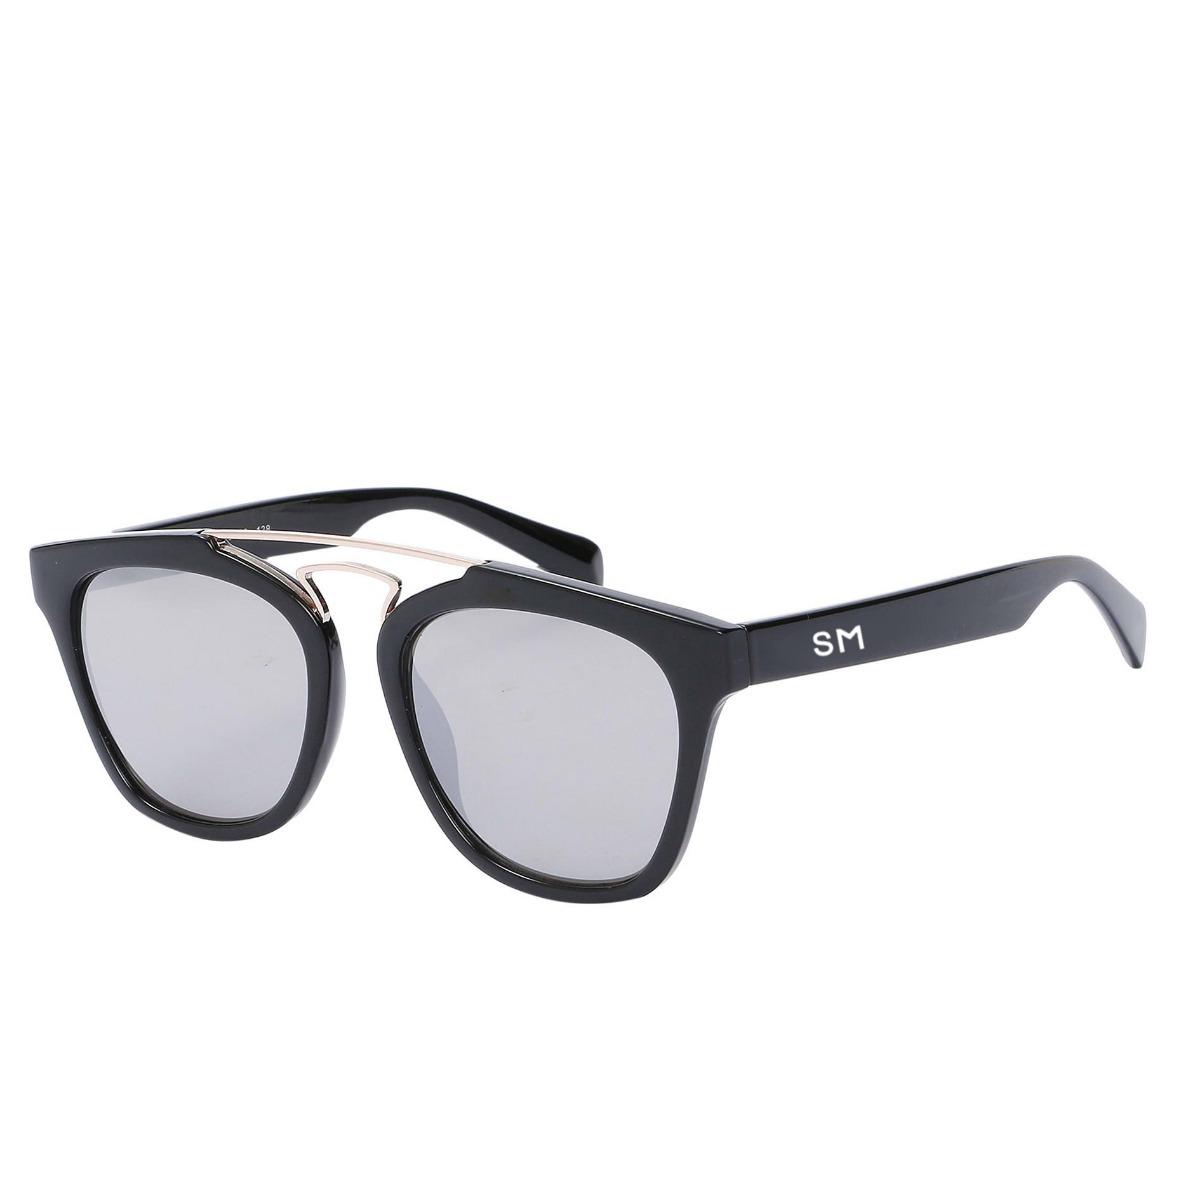 Óculos De Sol Masculino Sandro Moscoloni Adrien Preto - R  139,90 em ... 5fc9560a13